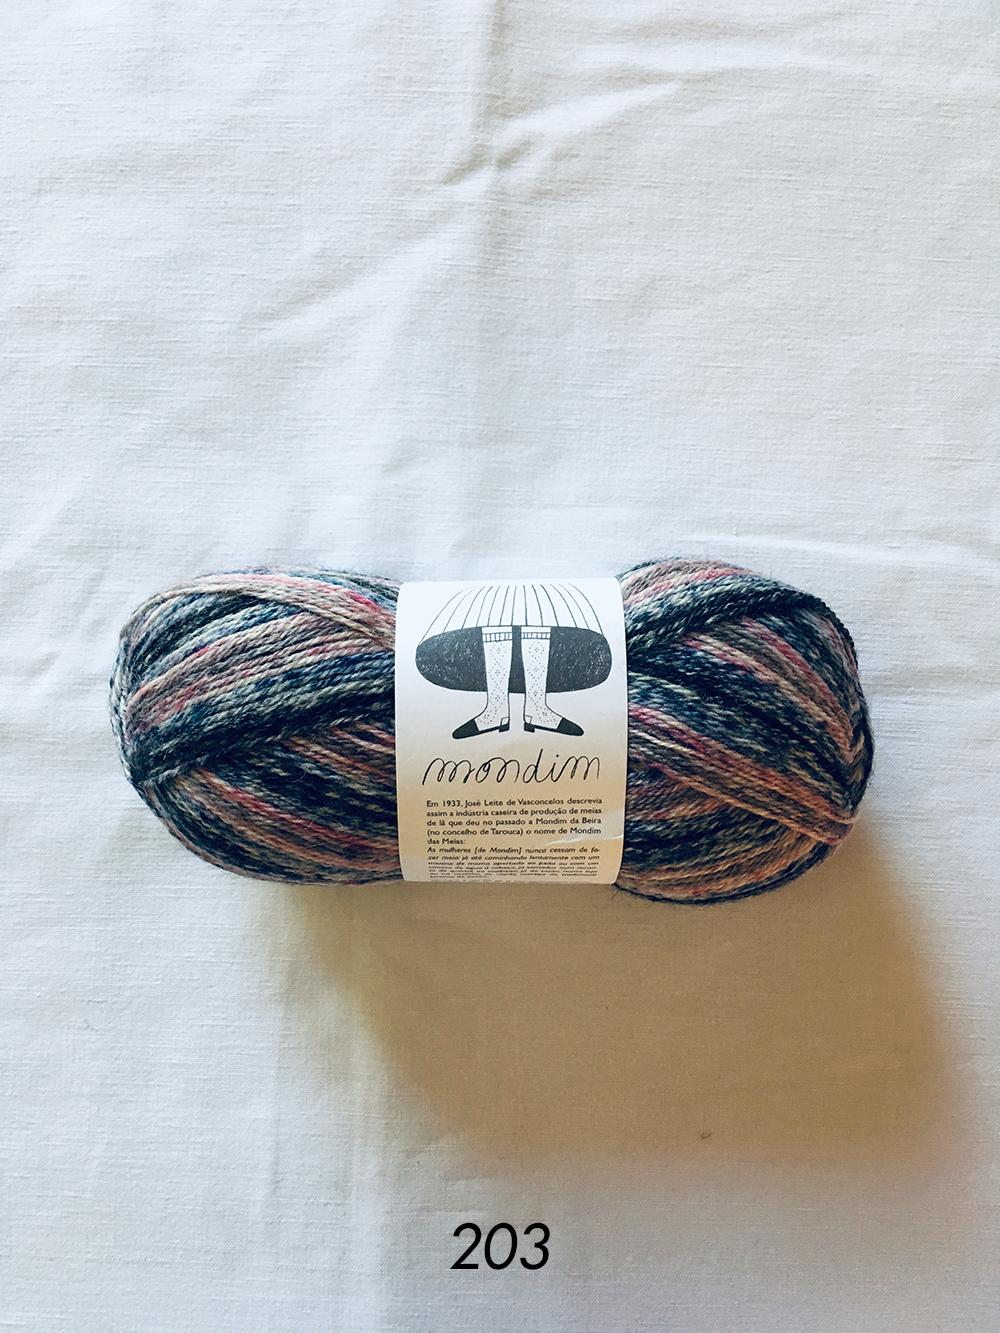 retrosaria_mondim_203_wool_done_knitting_.jpg